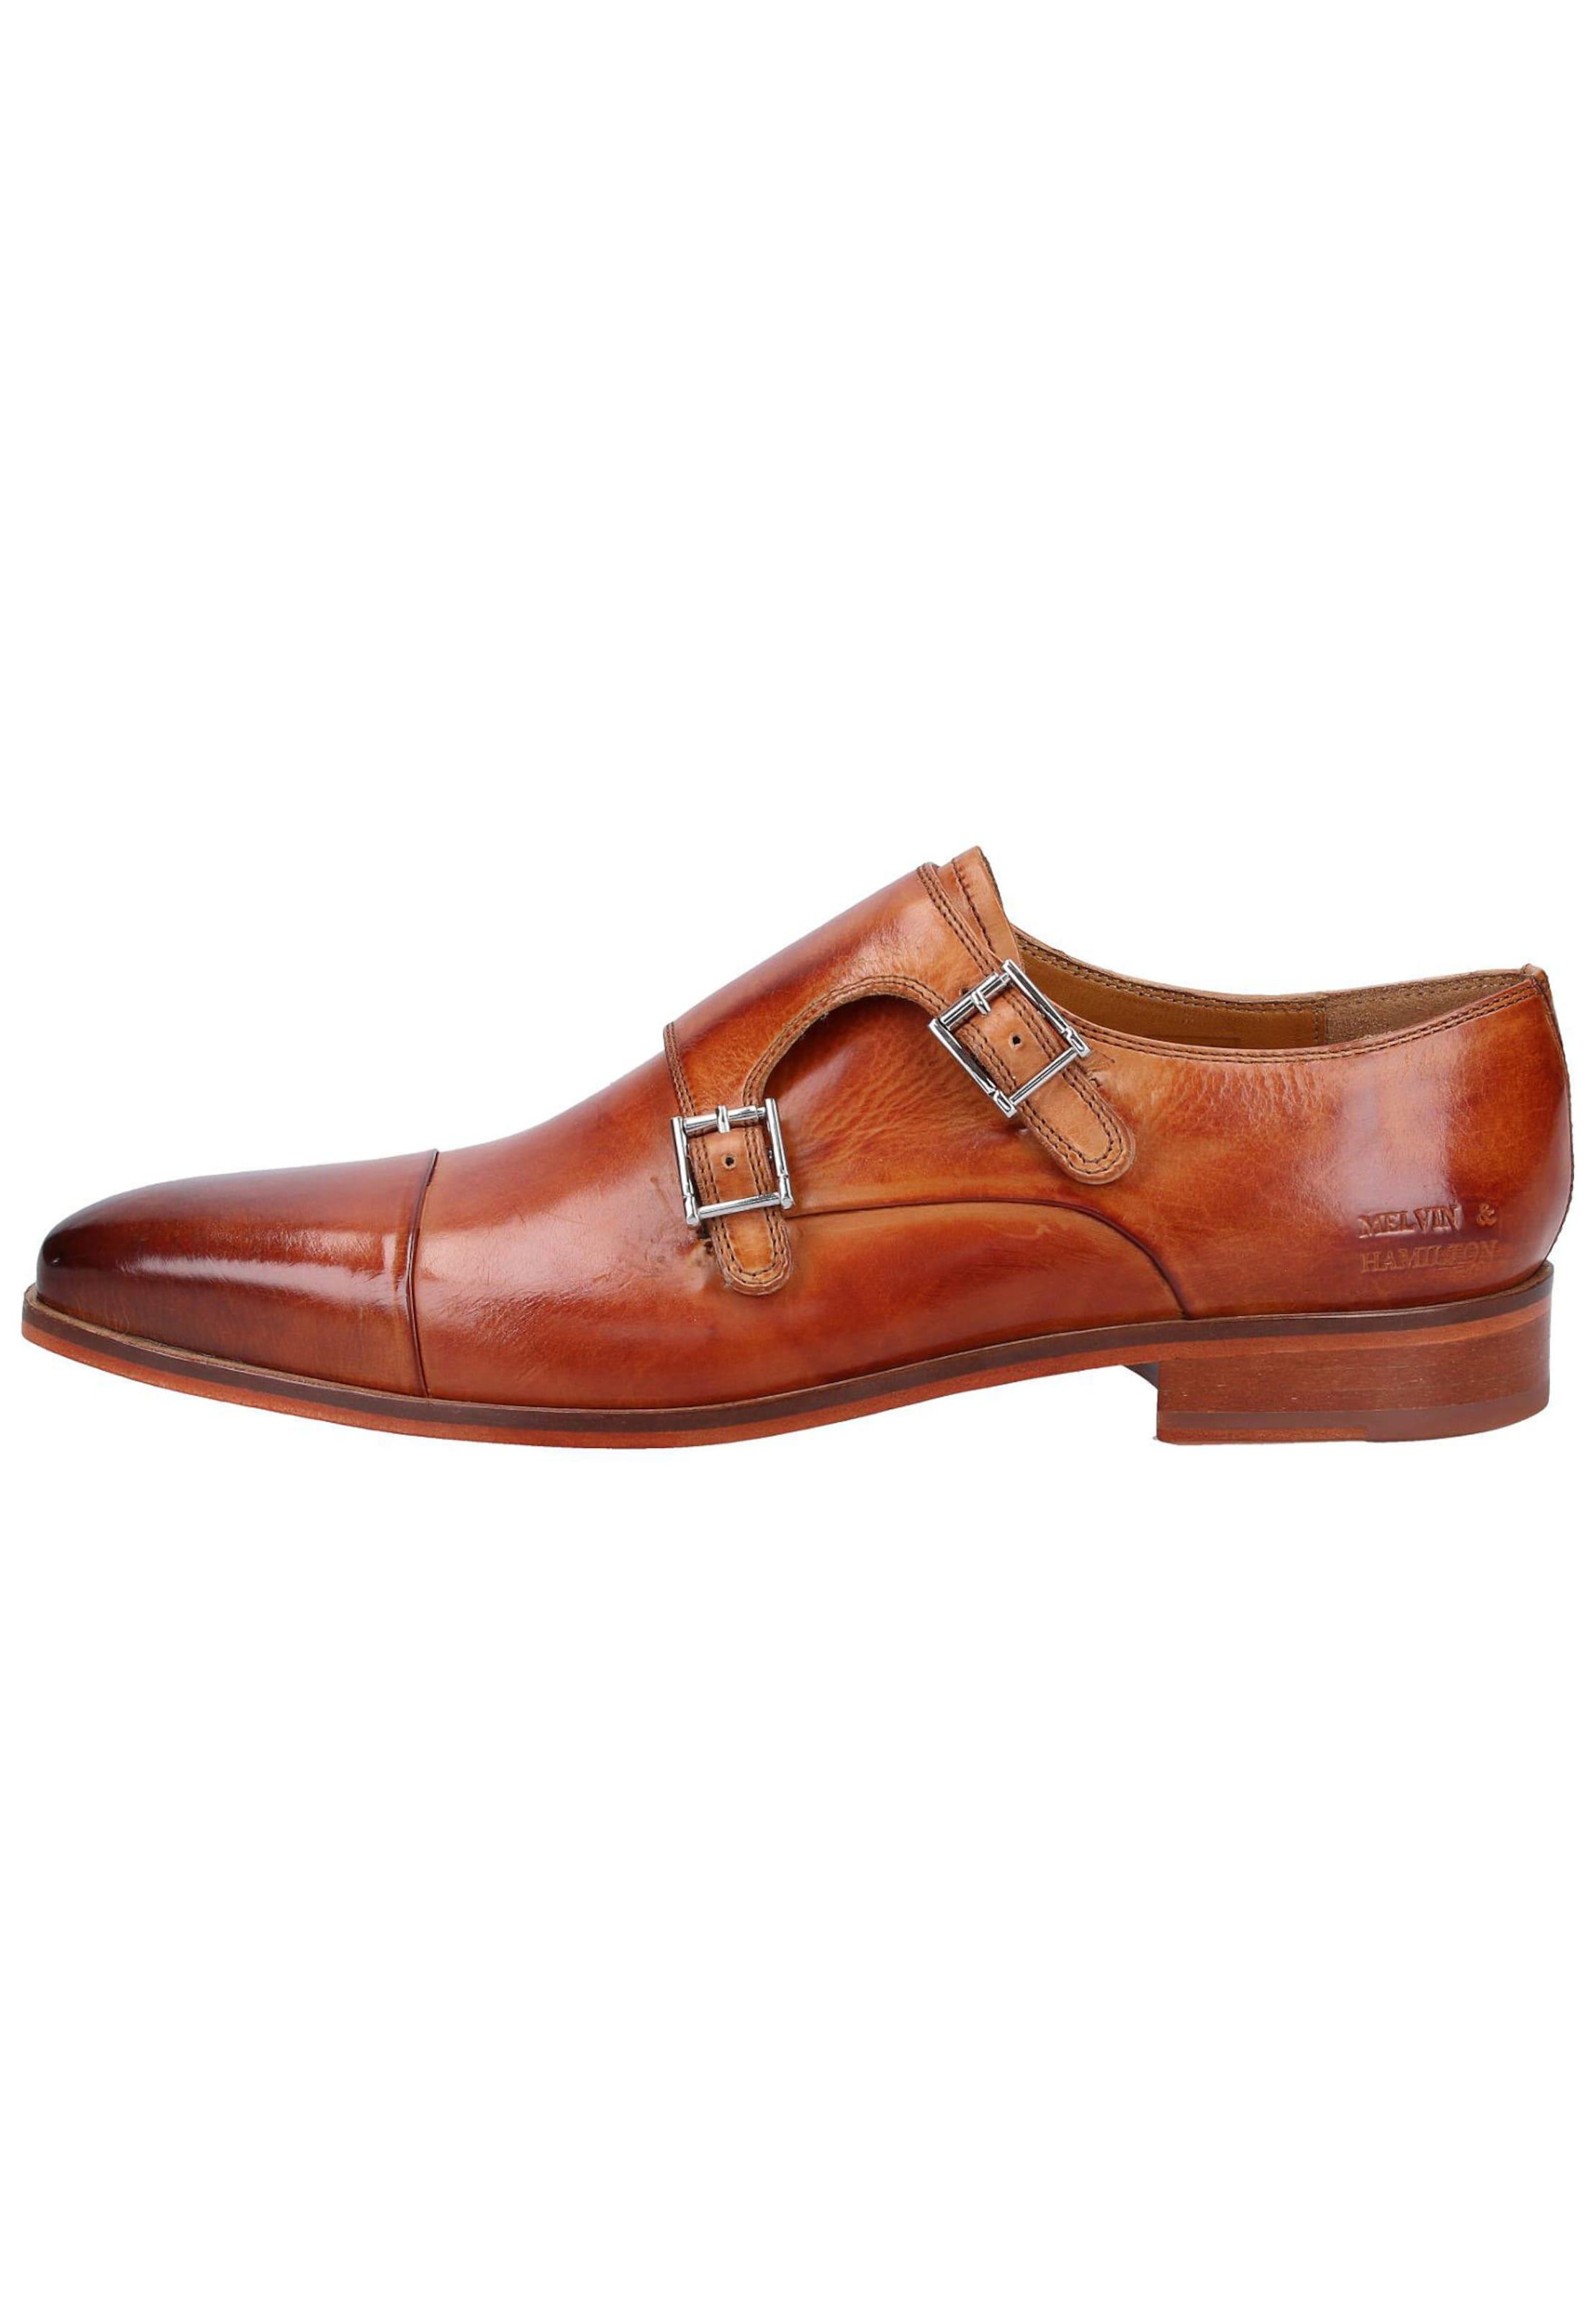 Melvinamp; Schuhe Hamilton In Hamilton Rostbraun Melvinamp; Rostbraun Schuhe Schuhe Hamilton Melvinamp; In shQxdCrt